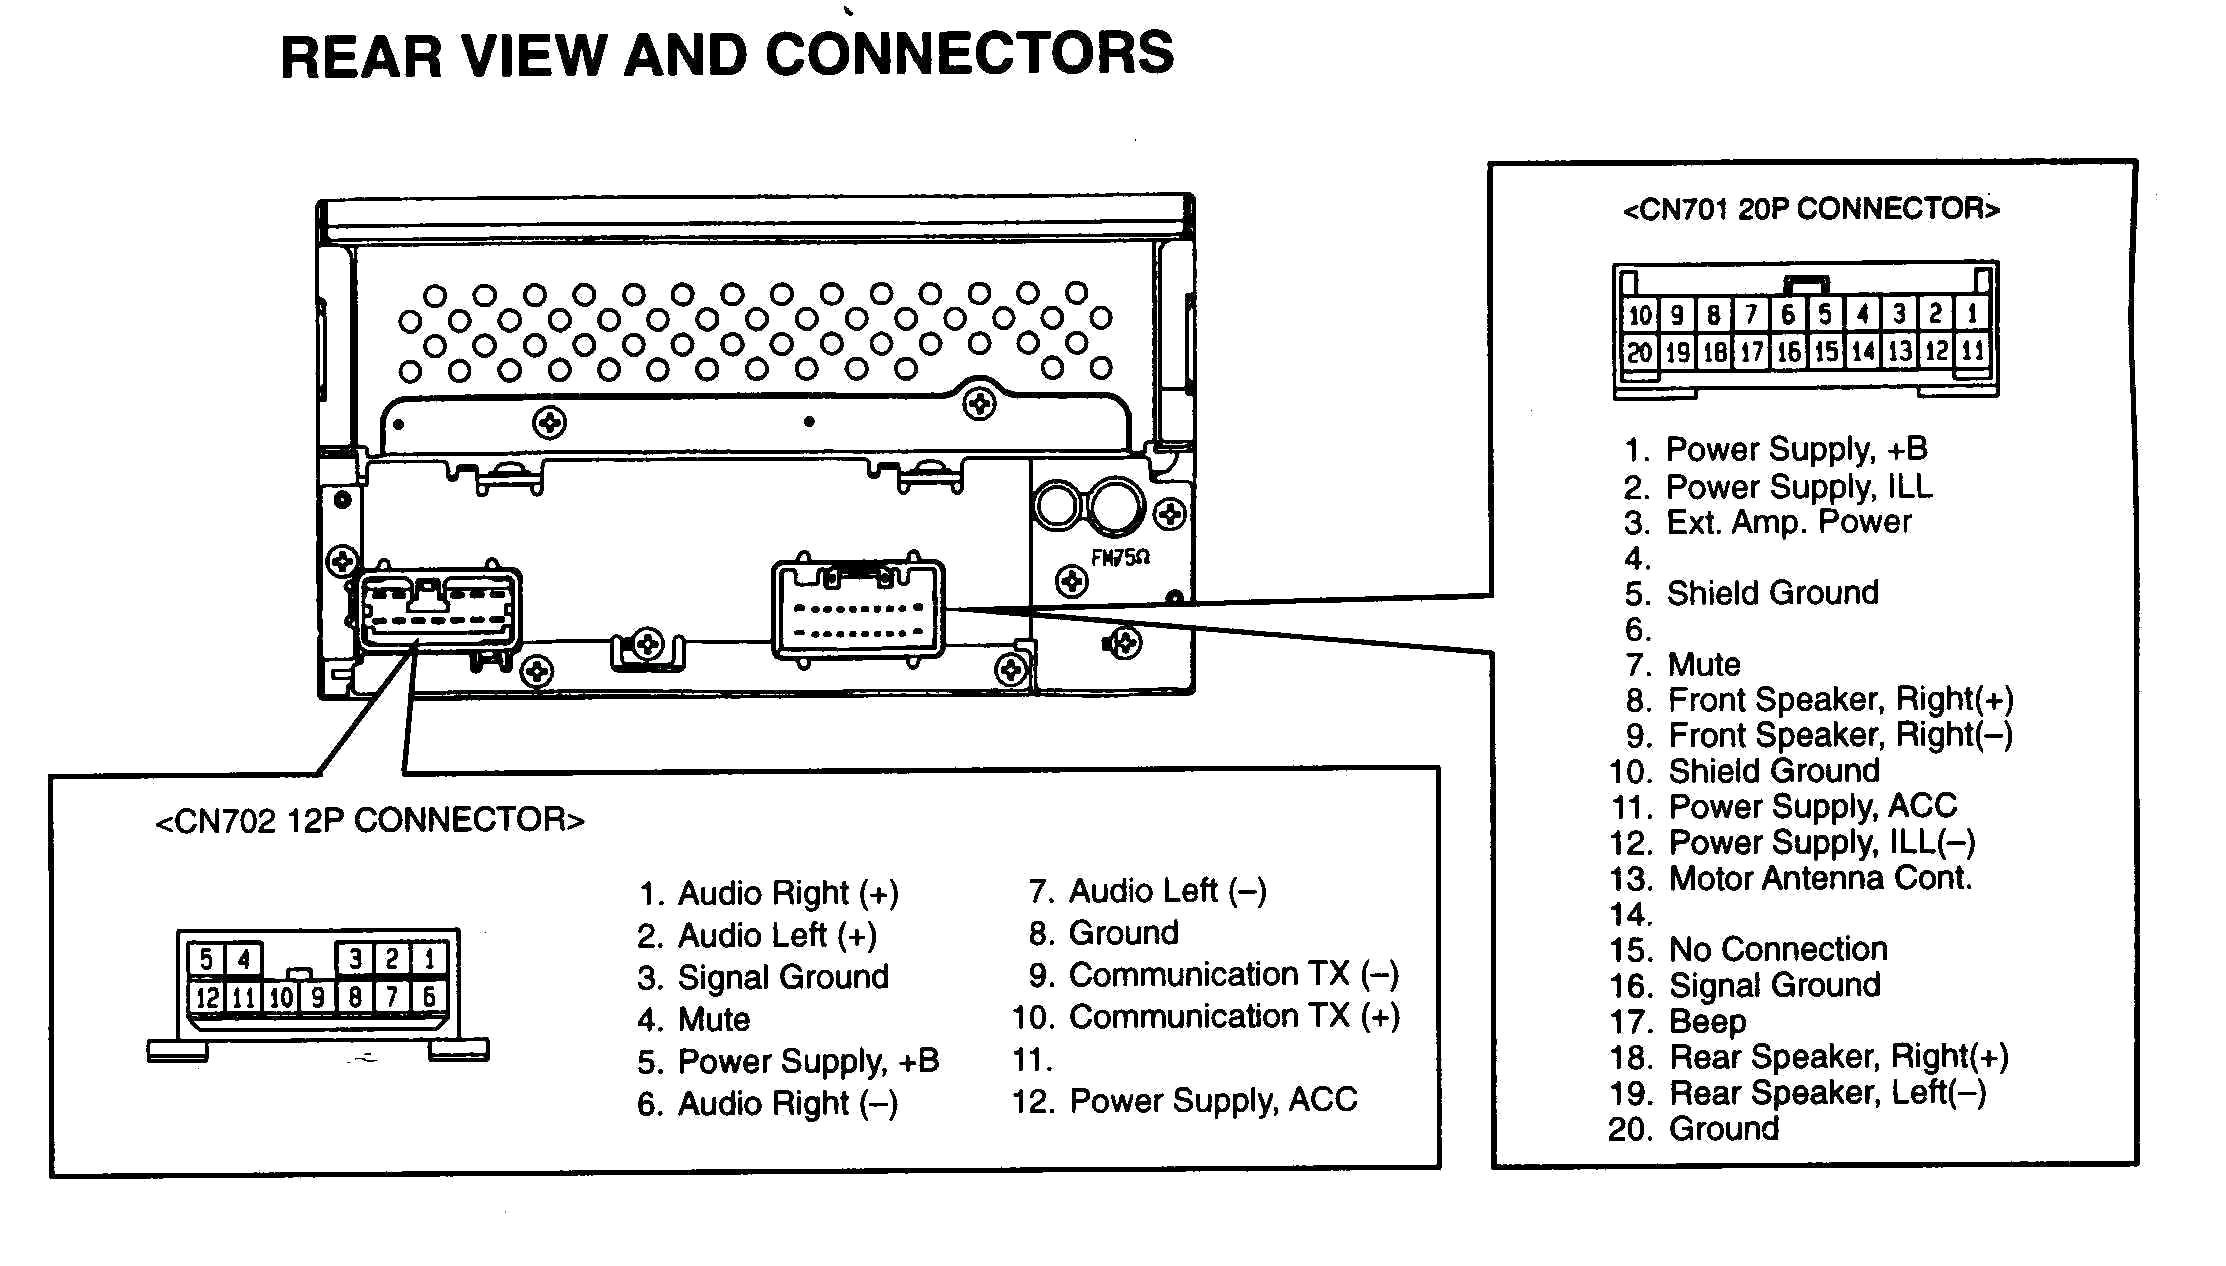 2001 Lincoln Navigator Engine Diagram 1951 Lincoln Wiring Diagram Worksheet and Wiring Diagram • Of 2001 Lincoln Navigator Engine Diagram